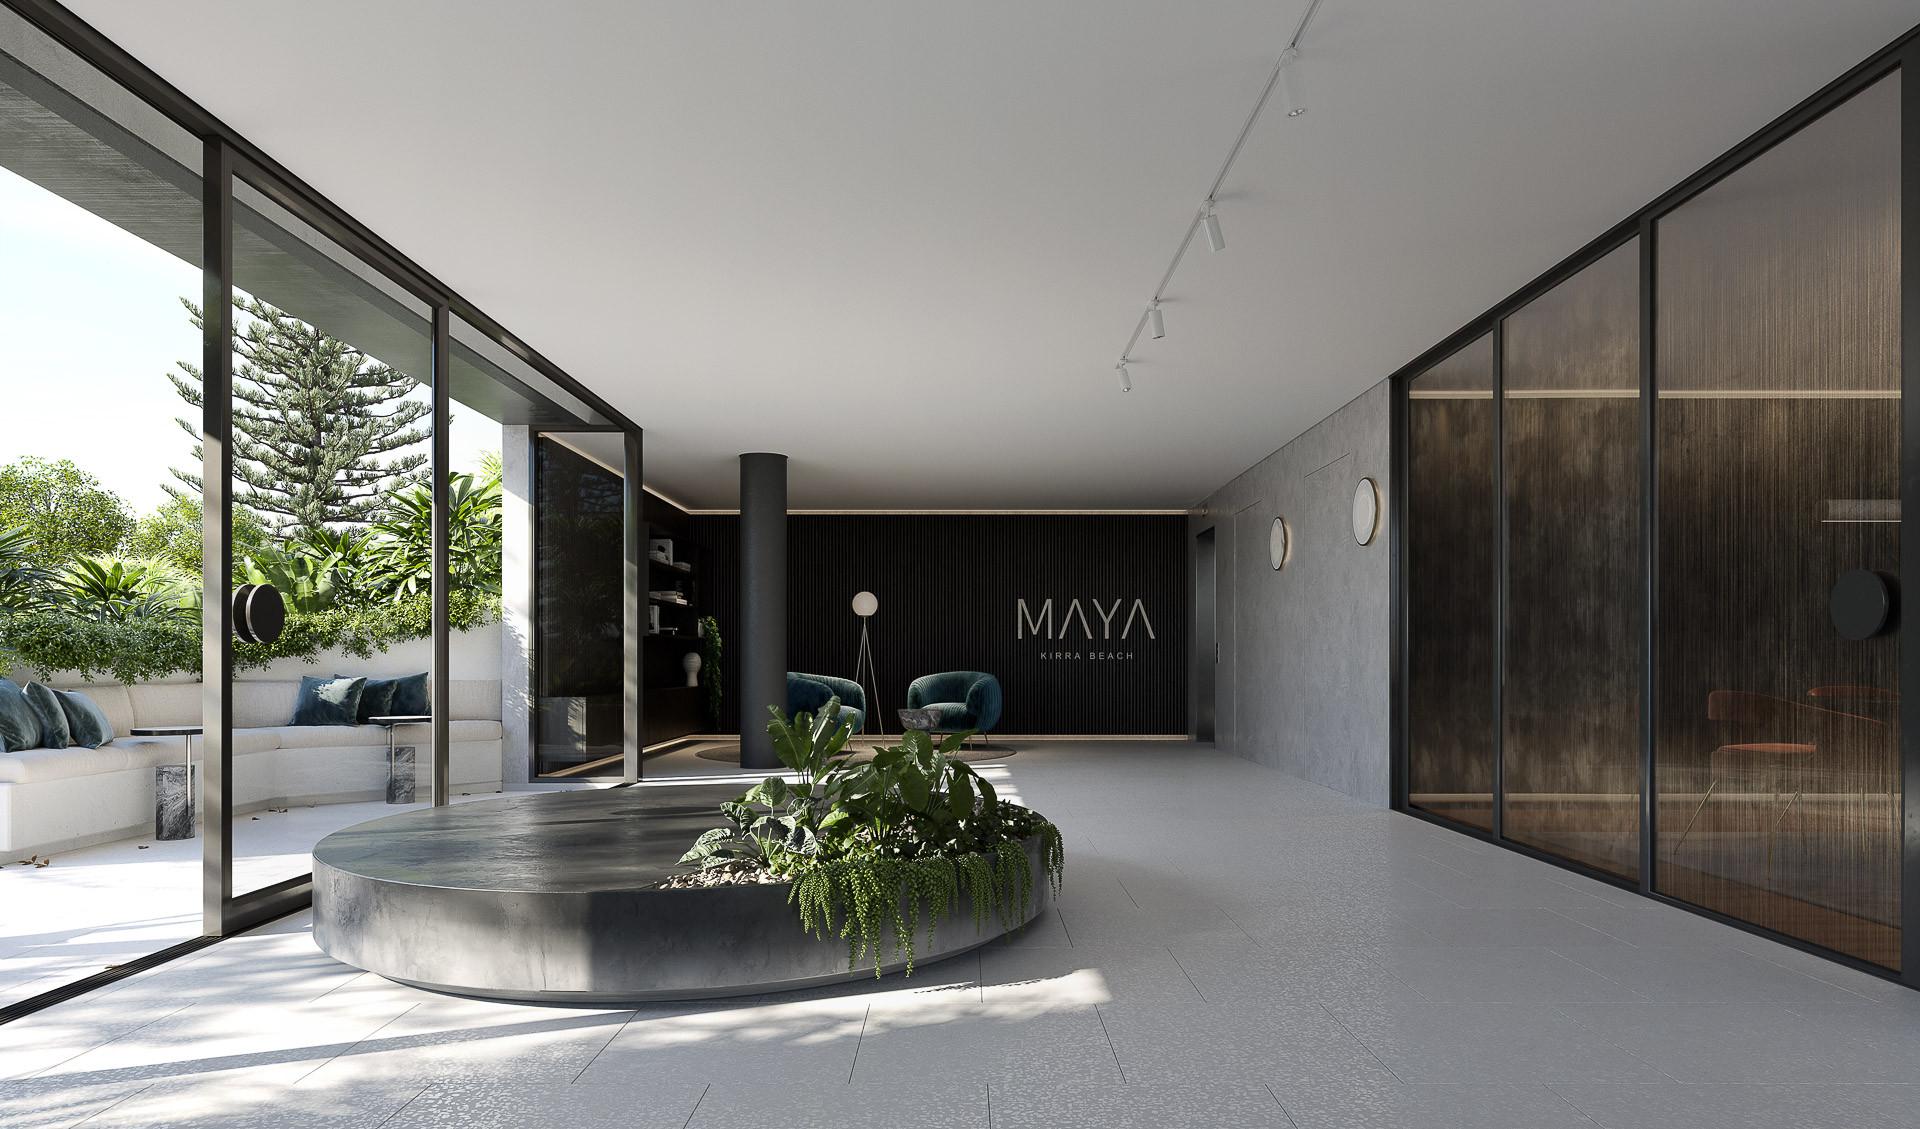 Maya_07.jpg